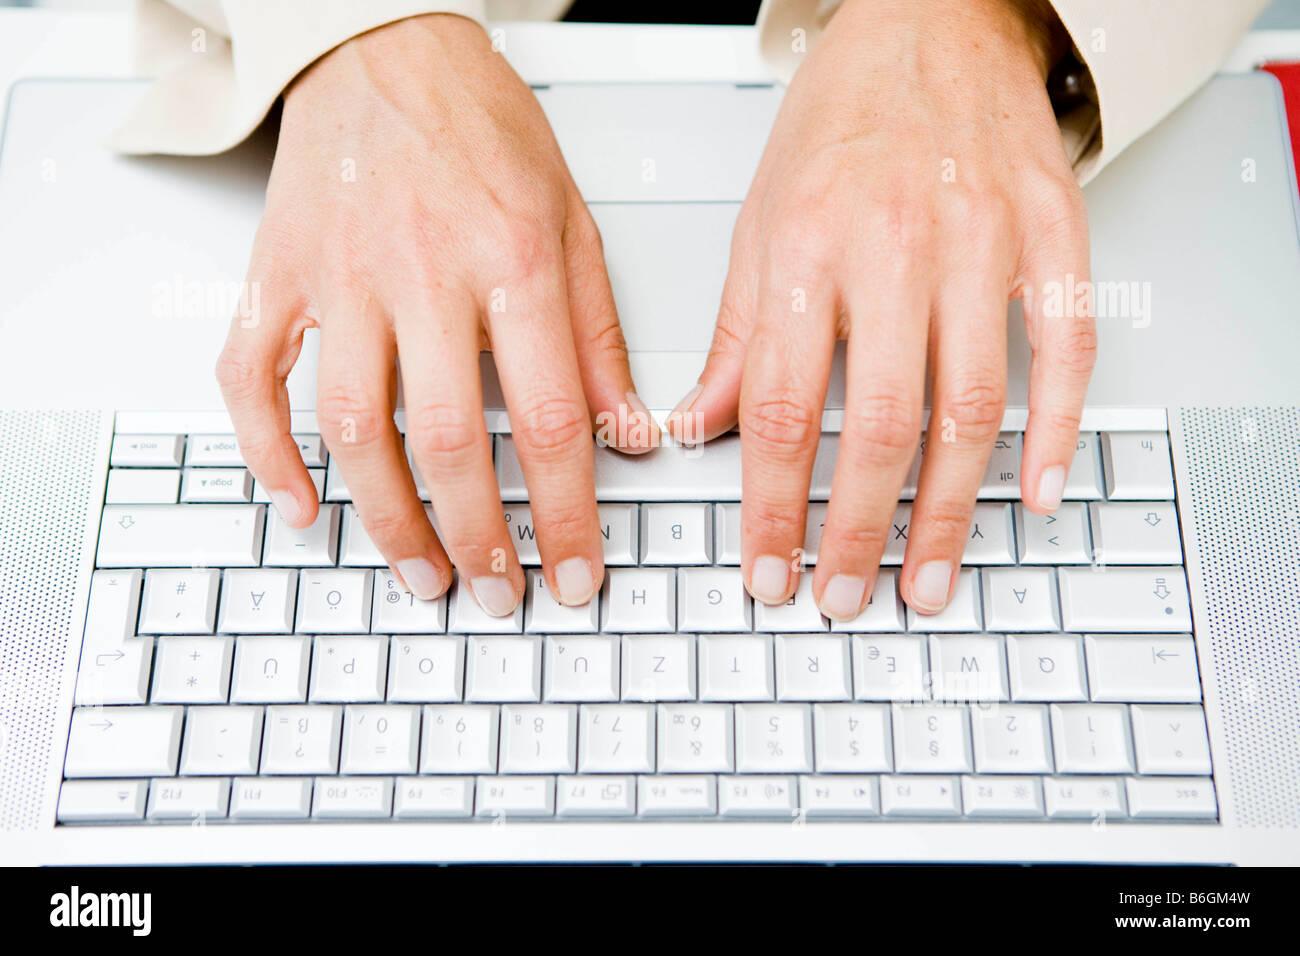 Pair of hands at keyboard - Stock Image